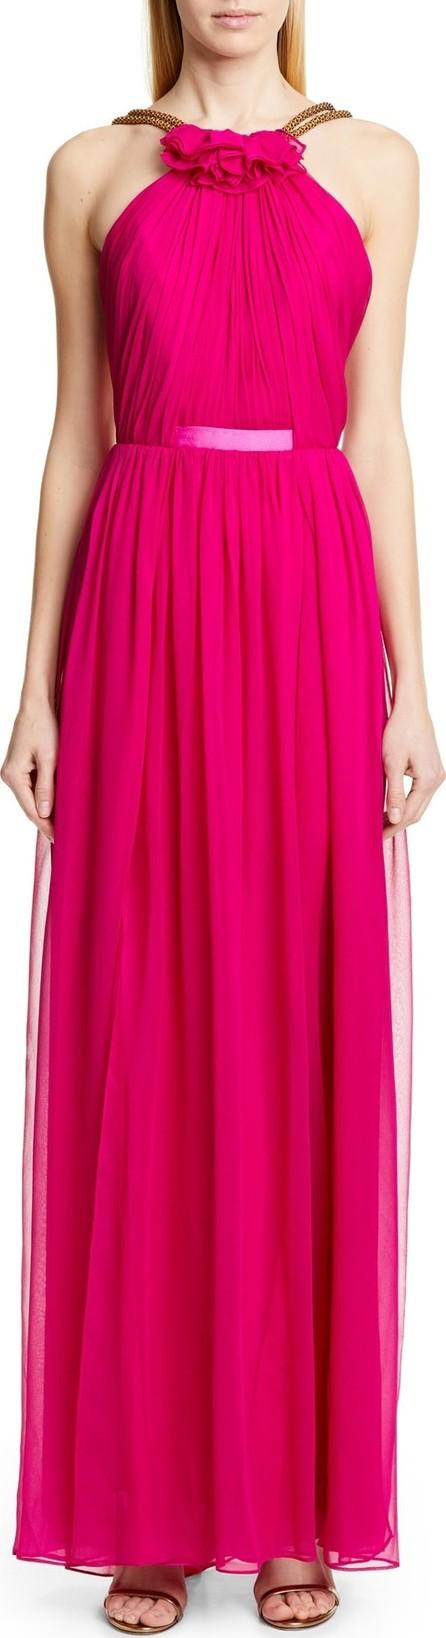 Haney Emeline Halter Silk Chiffon Evening Dress